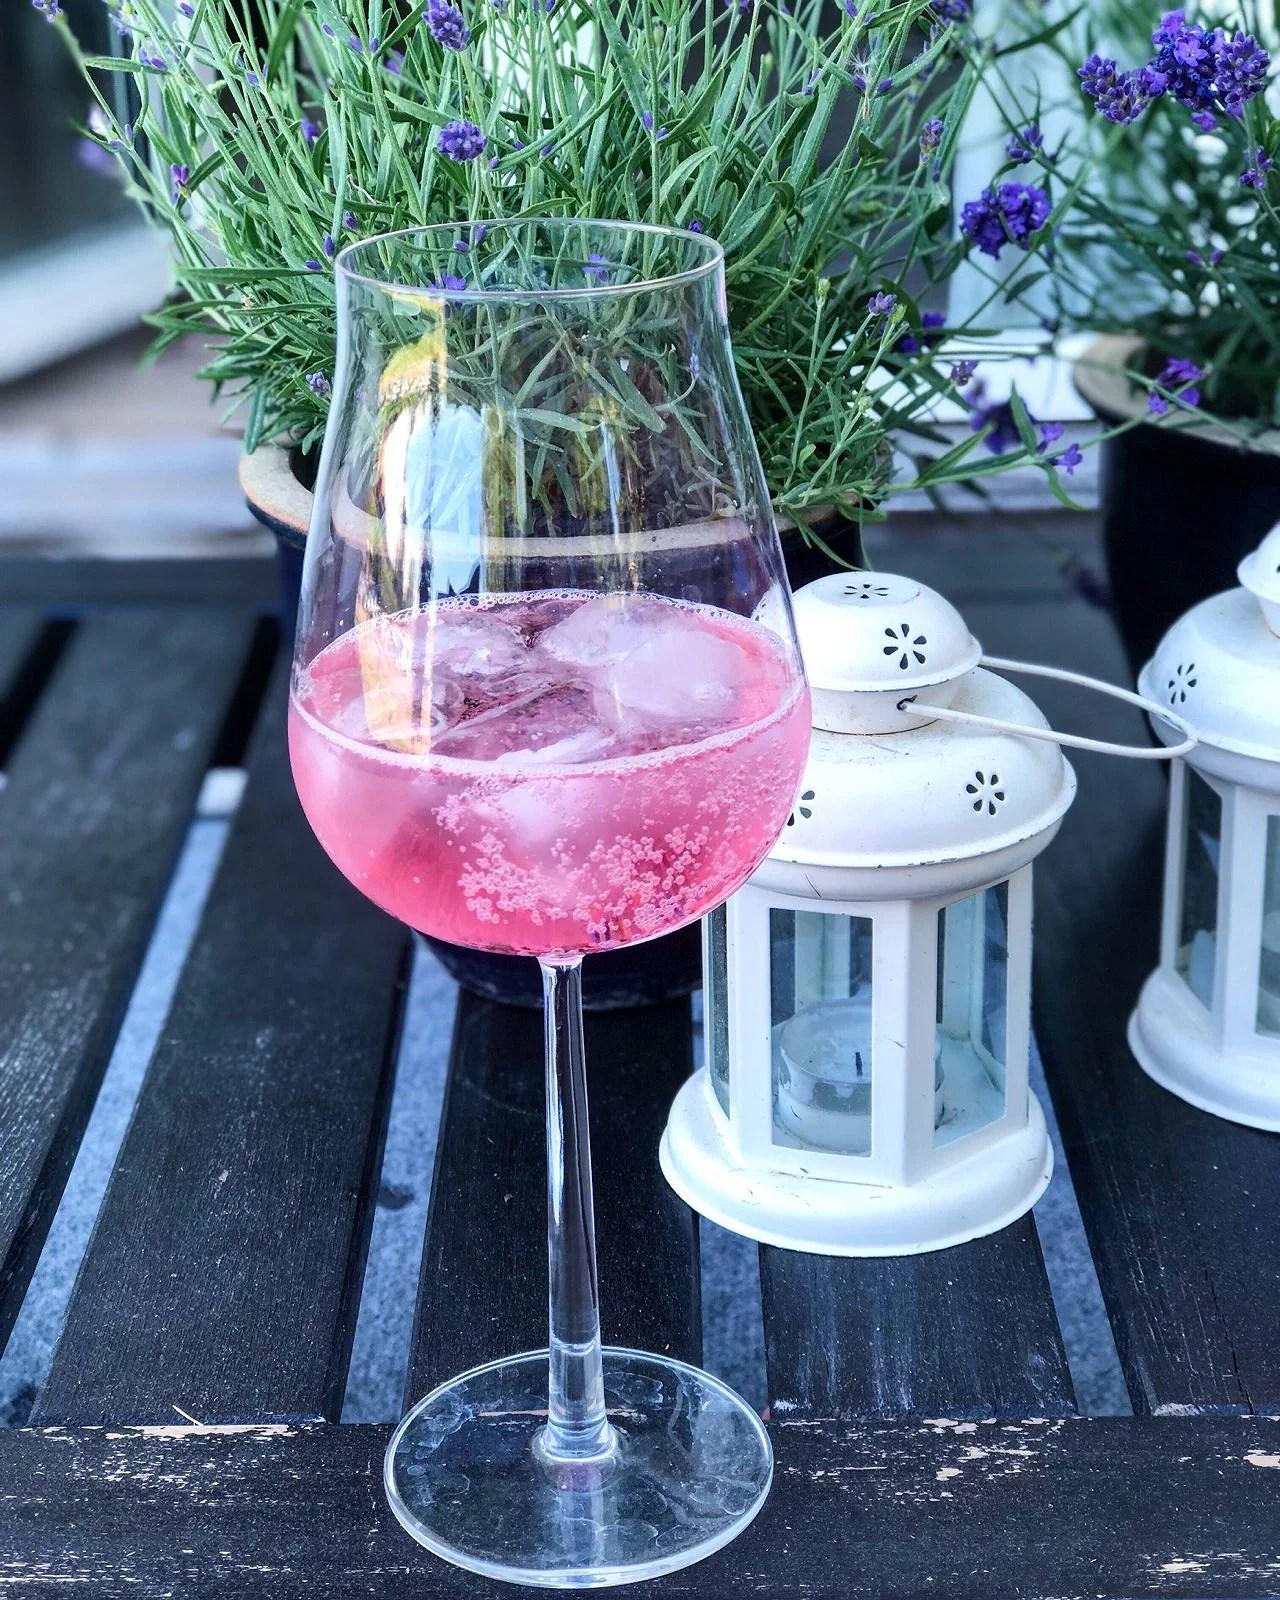 En sommar i Floda/Göteborg!